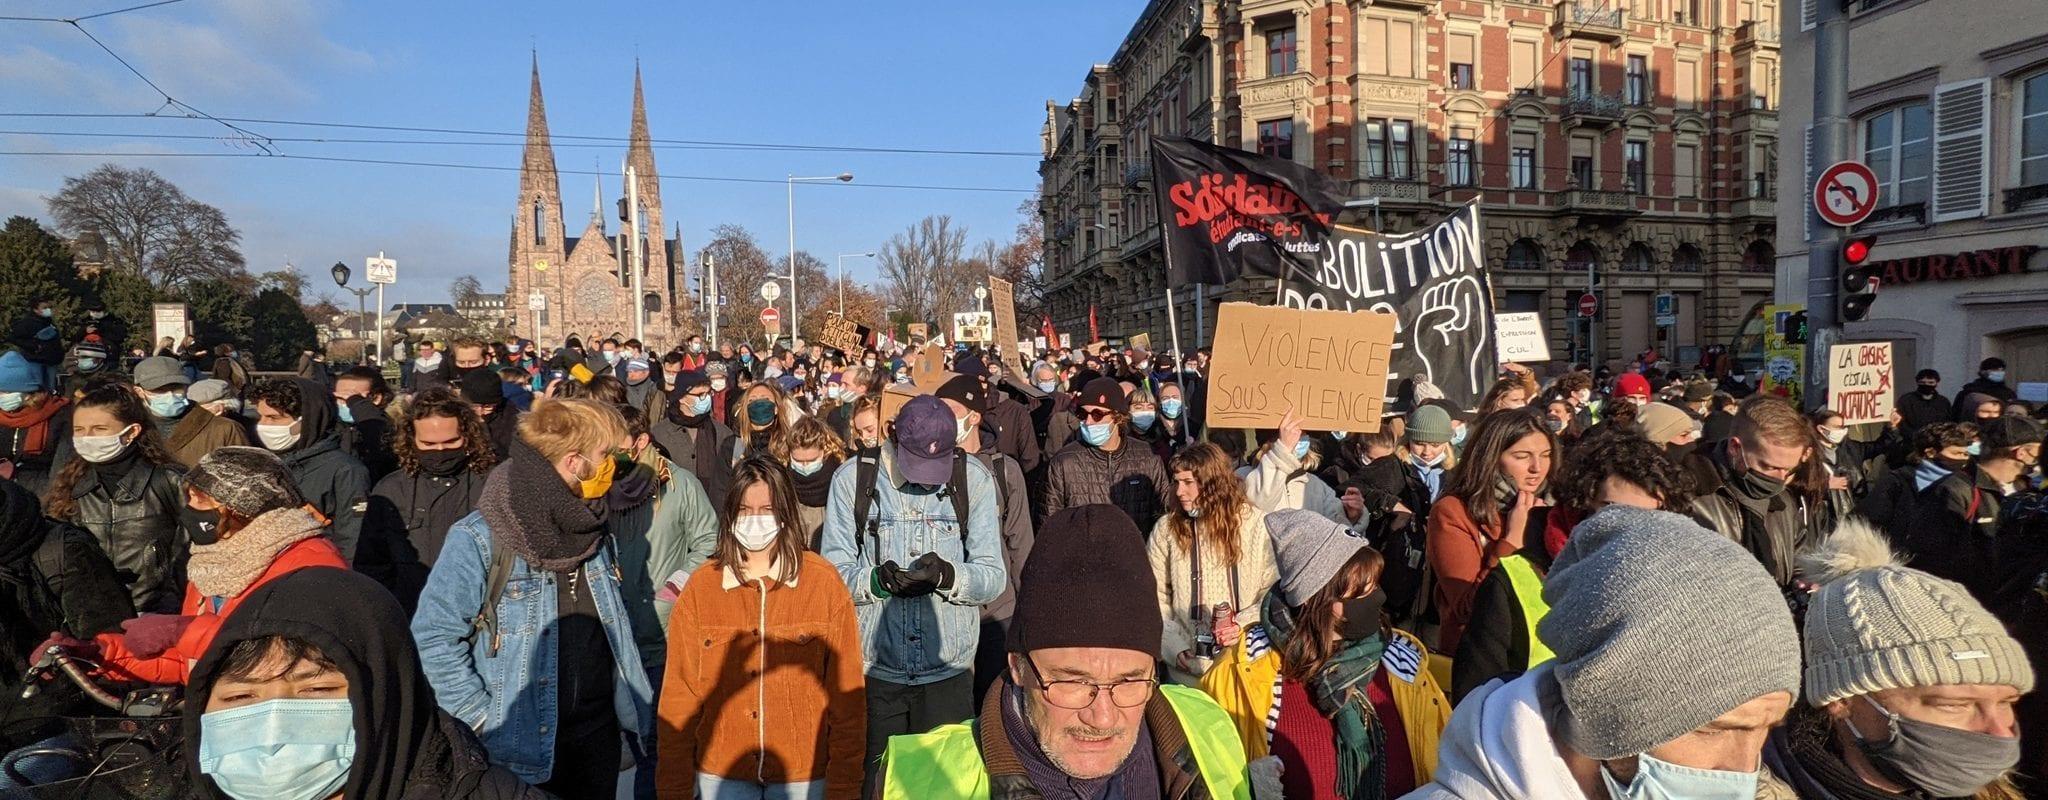 Samedi, huitième manifestation contre la loi de Sécurité globale